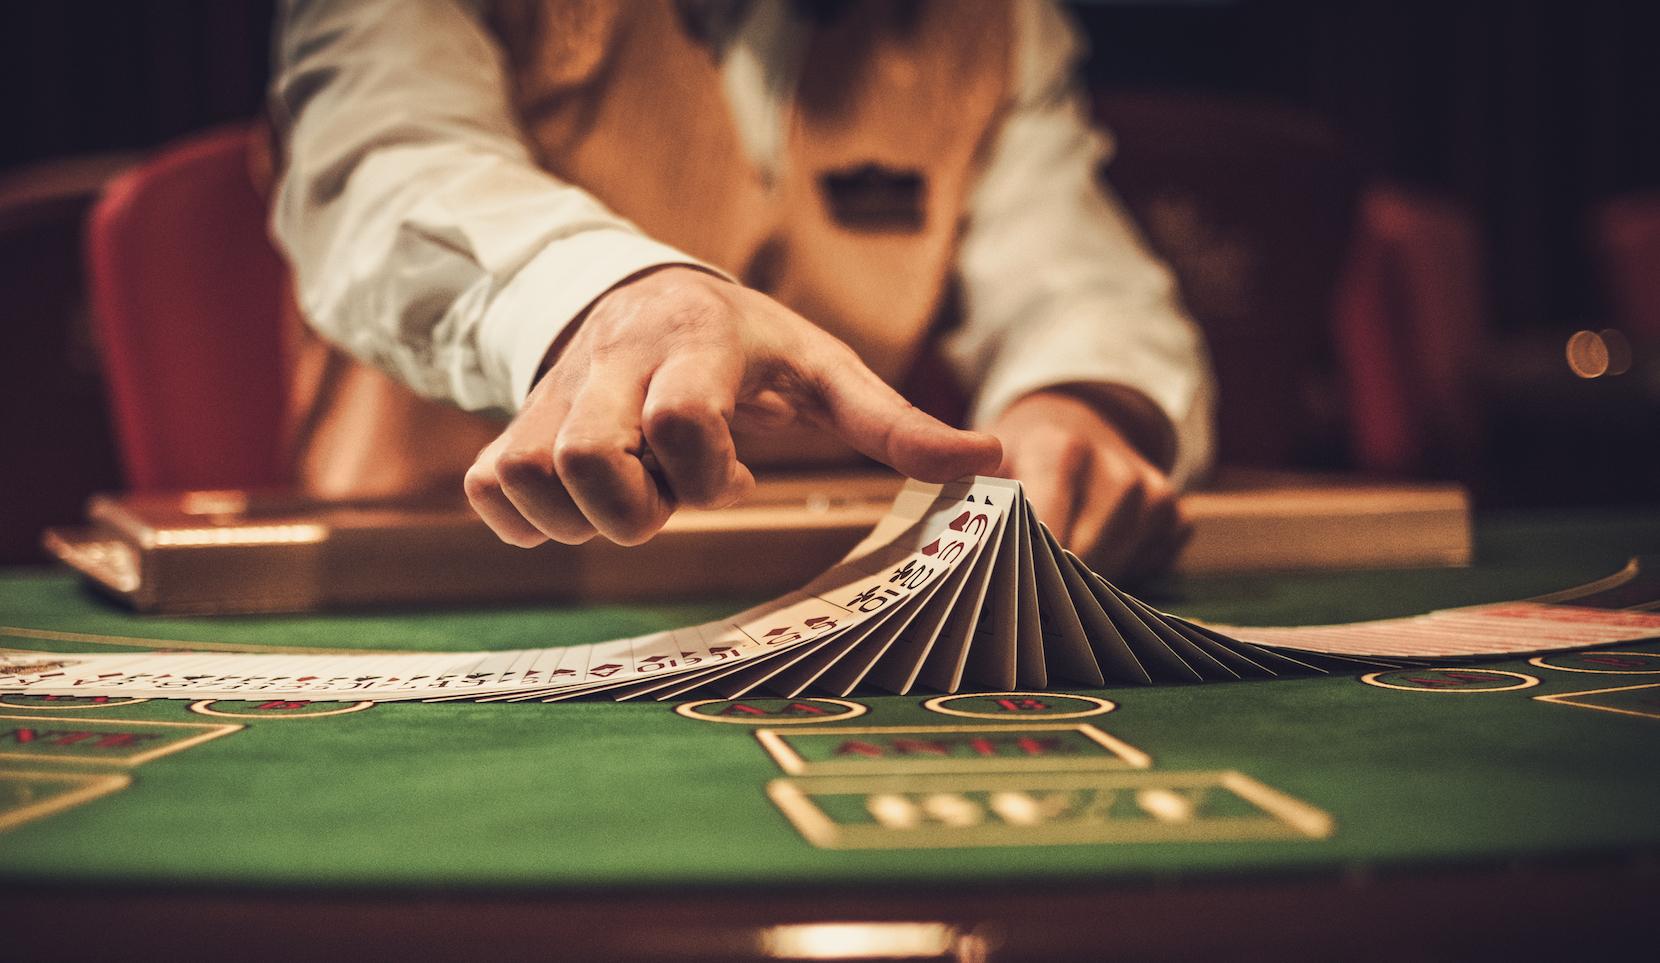 The Betting or Gambling